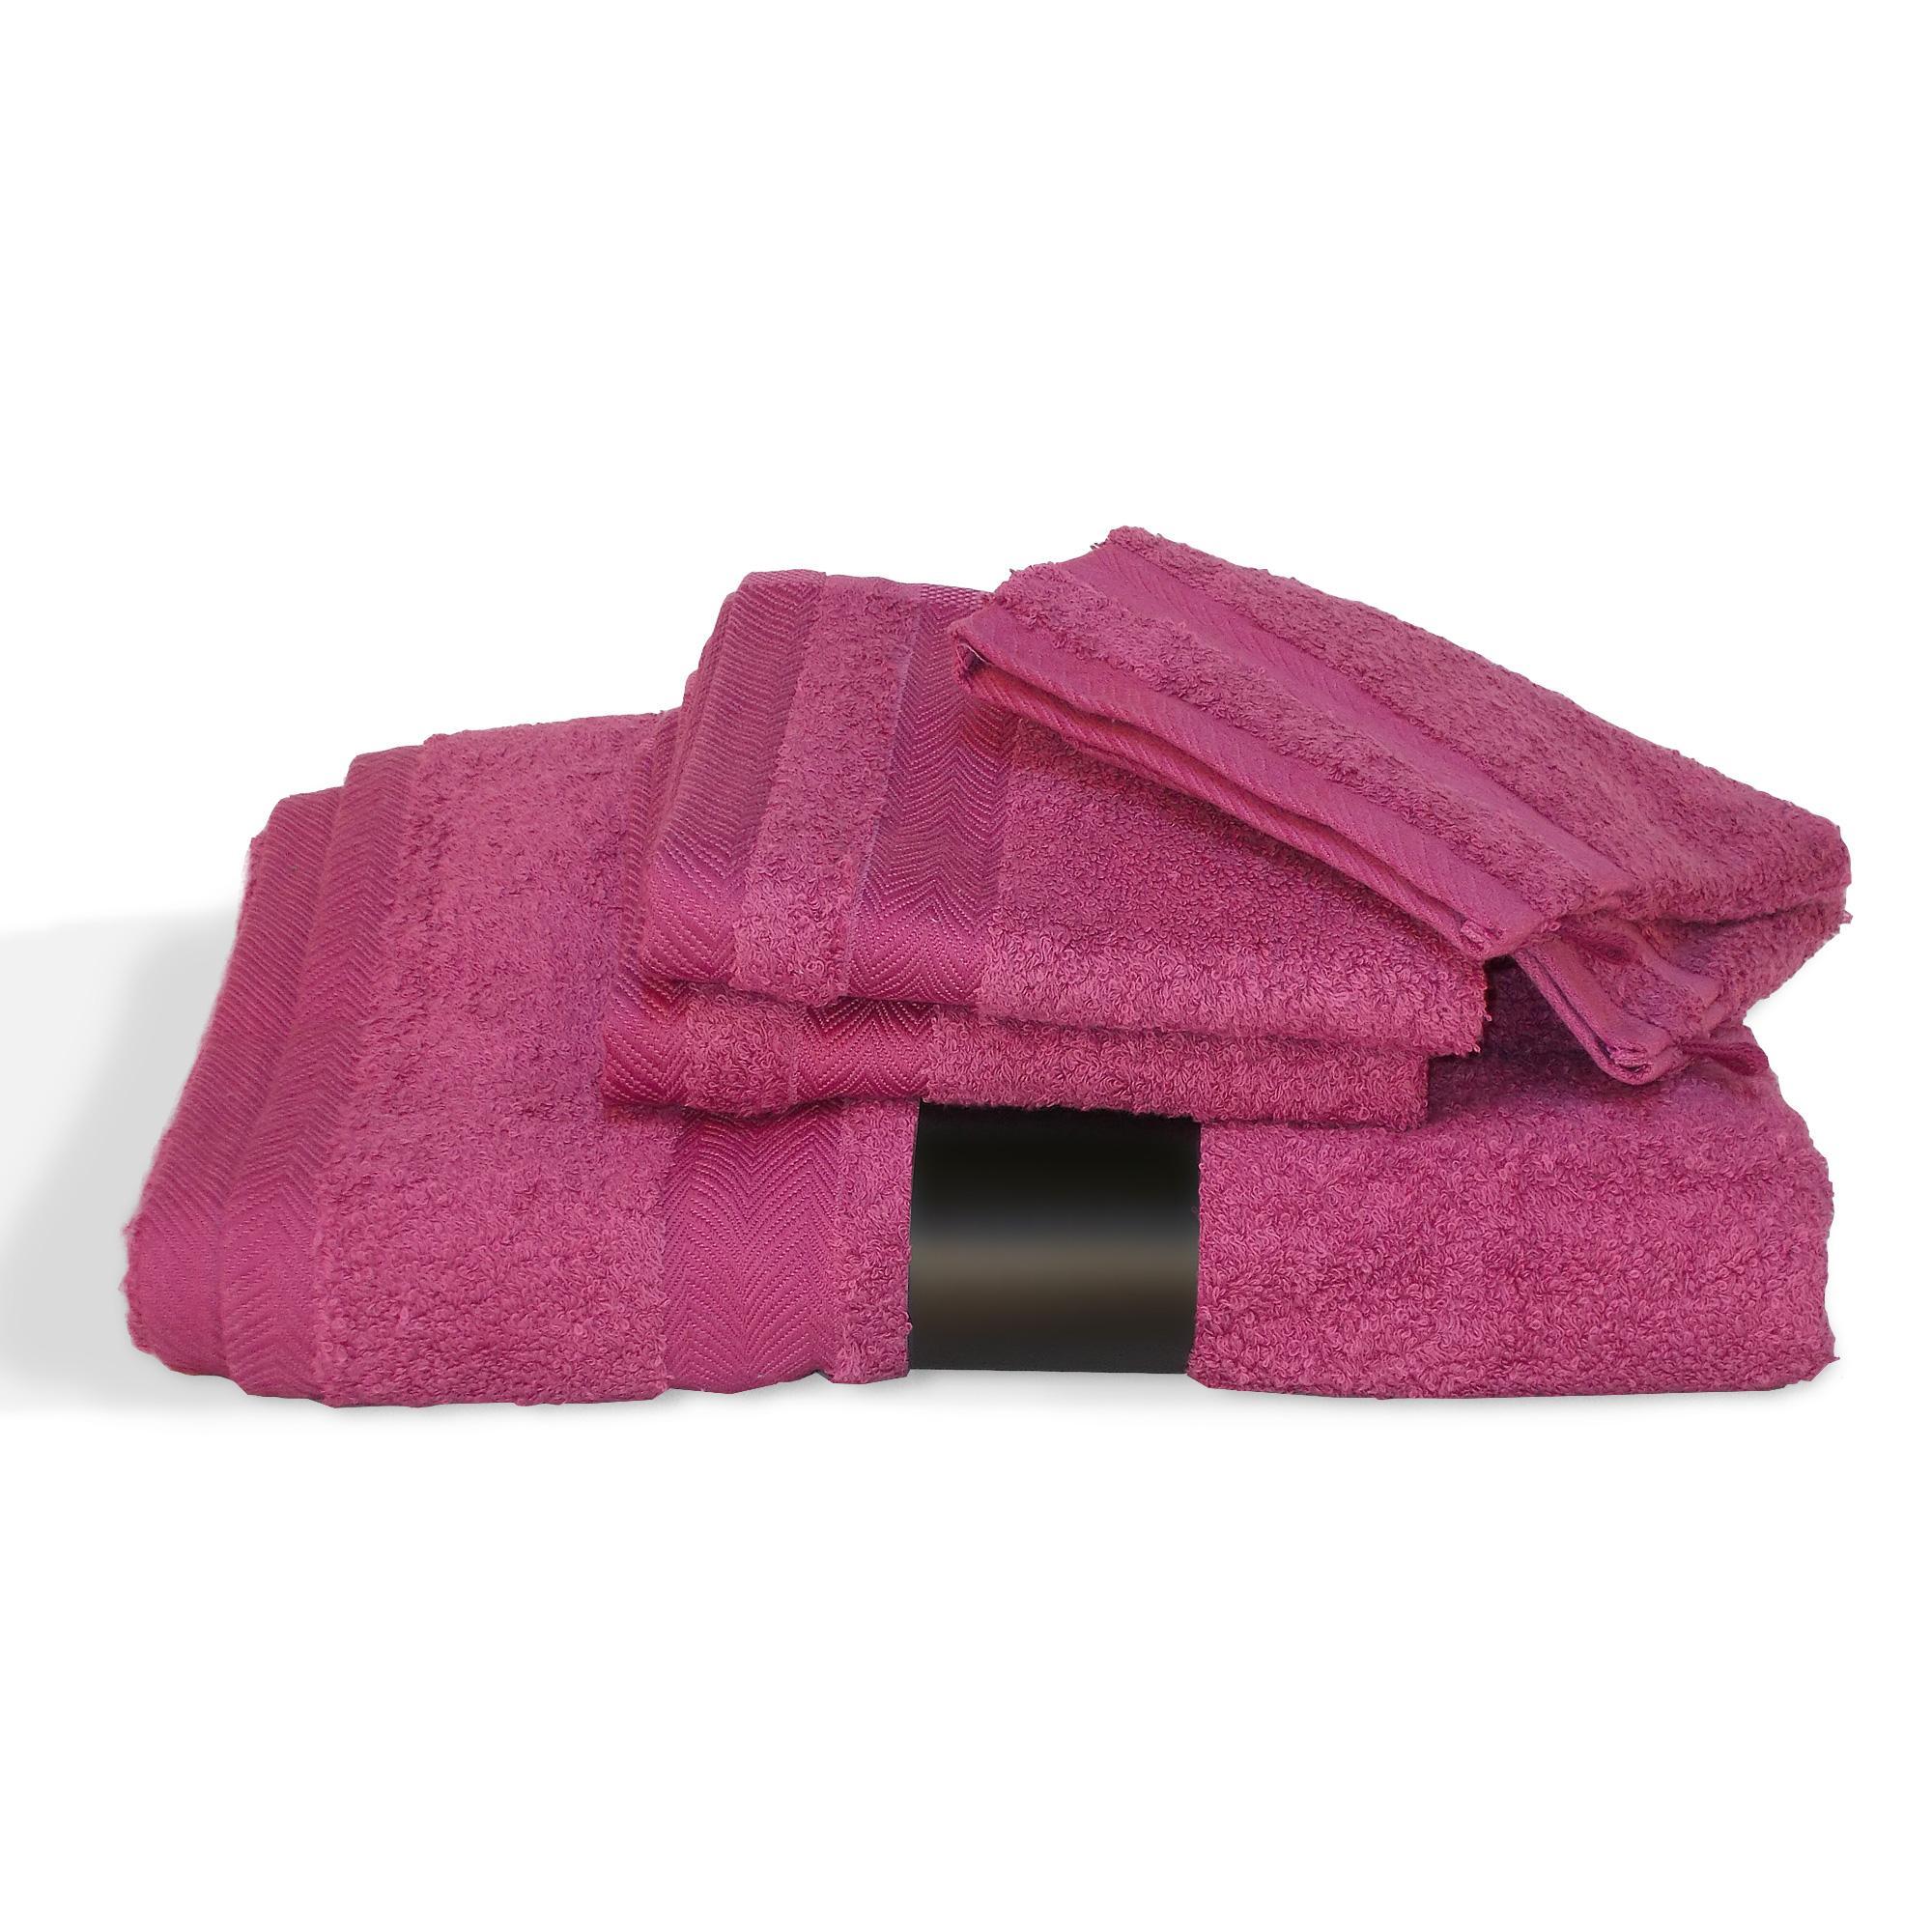 parure de bain 5 pi ces royal cresent rose vin 650g m2 ebay. Black Bedroom Furniture Sets. Home Design Ideas